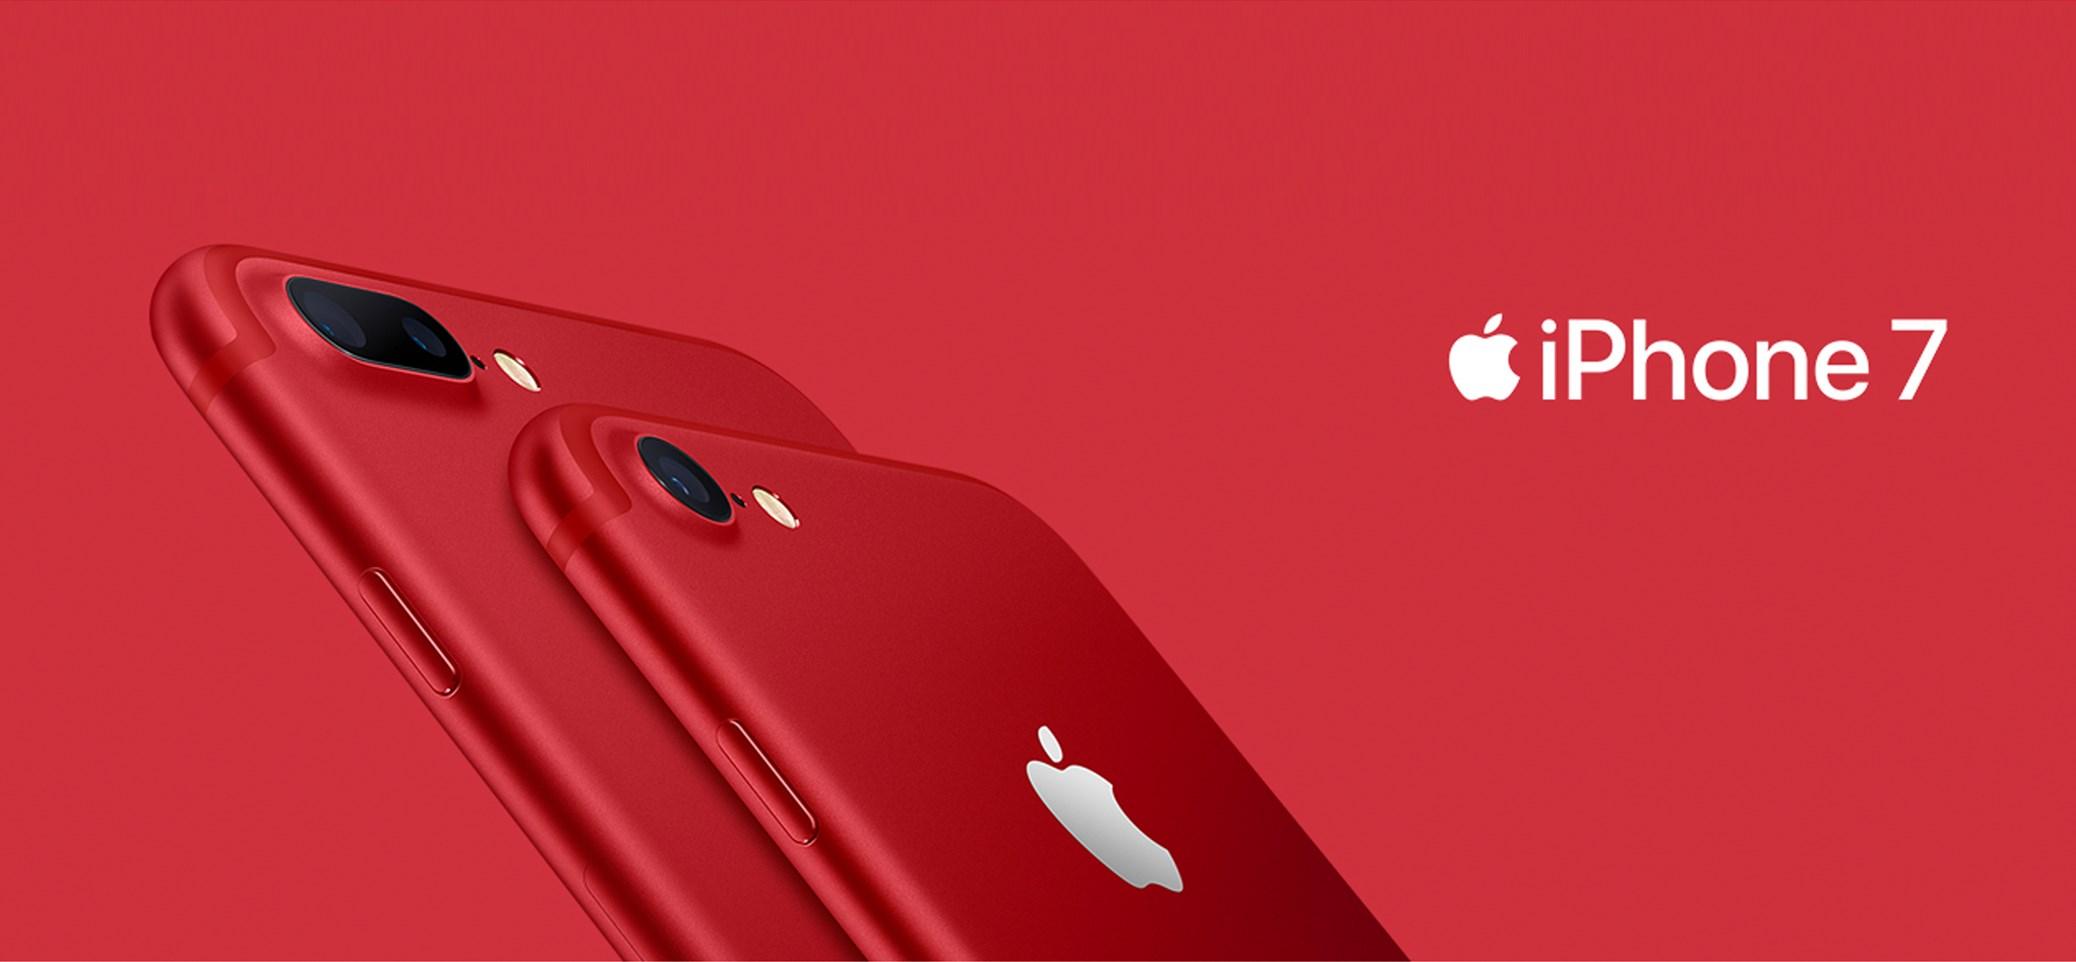 Iphone7redbanner